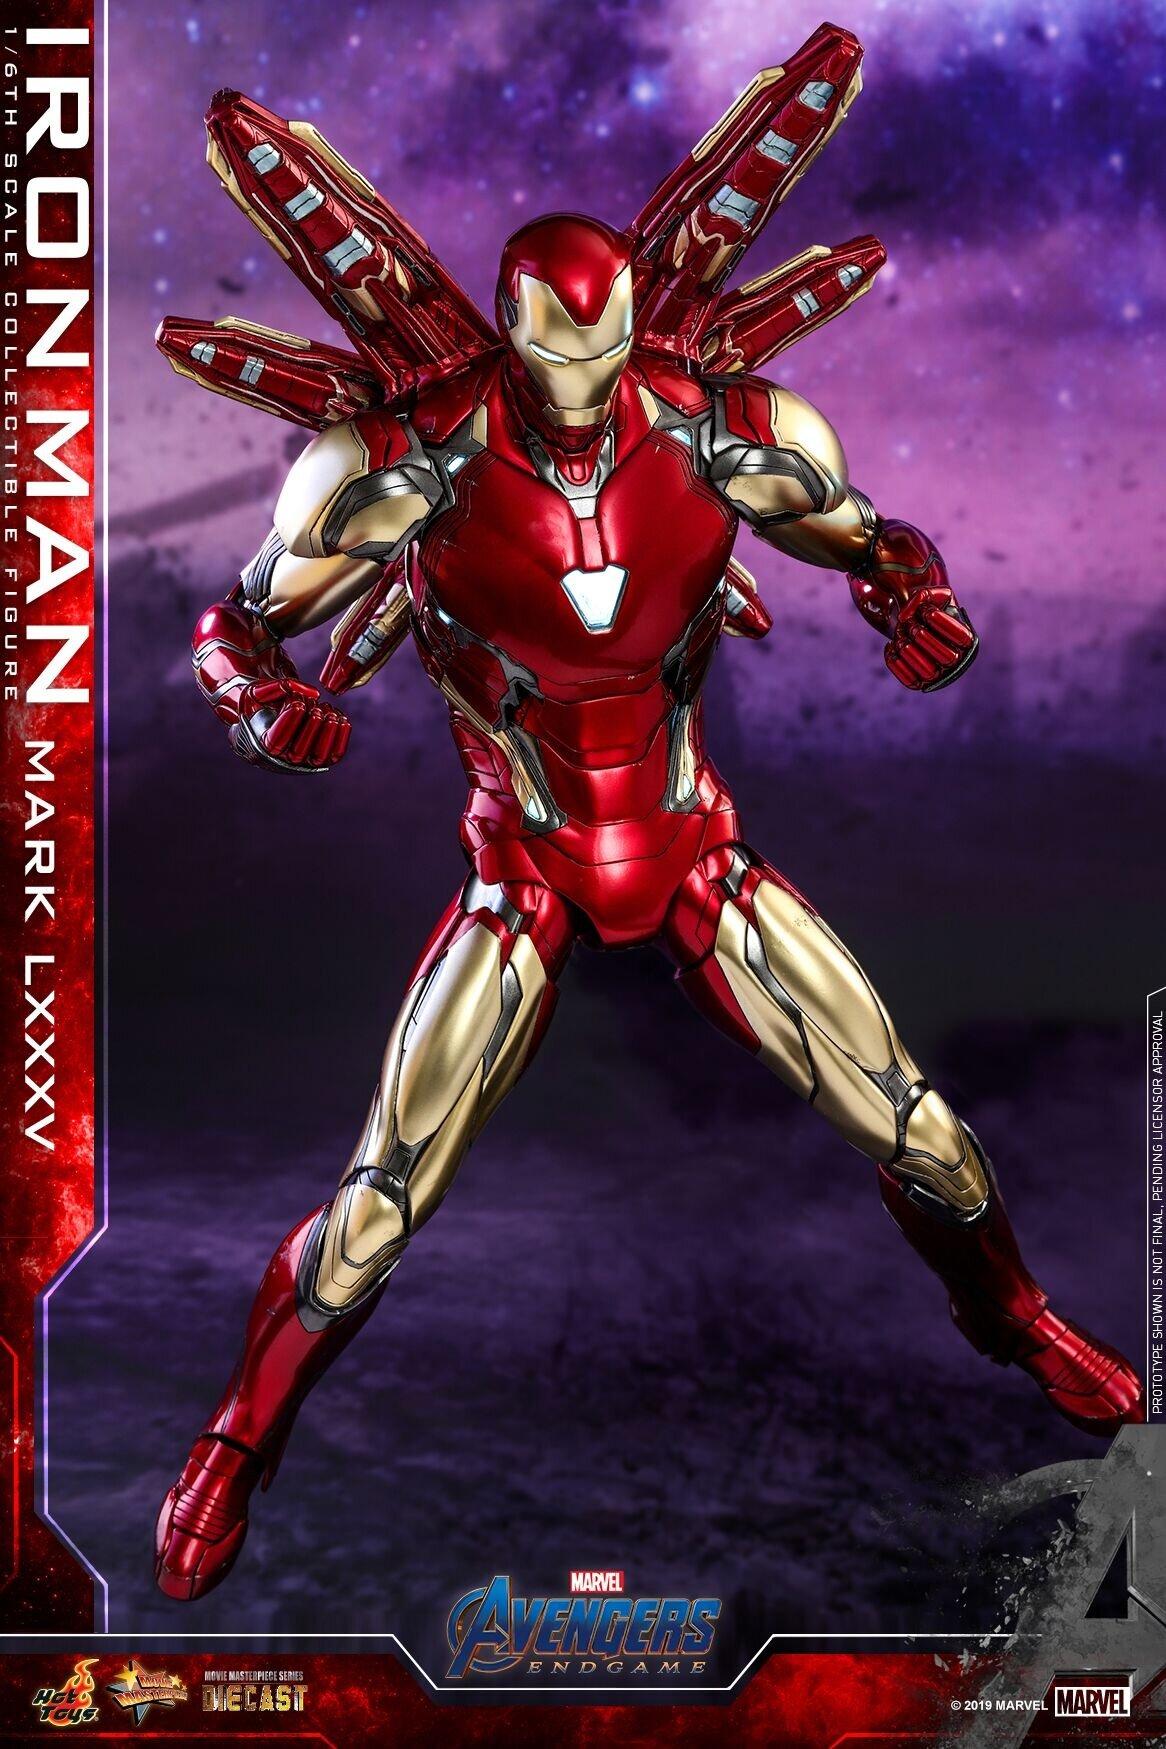 [Hot Toys] 어벤져스 : 엔드게임 아이언맨 마크85 다이캐스트 MMS528D30 - 1/6th scale Iron Man Mark LXXXV Collectible Figure